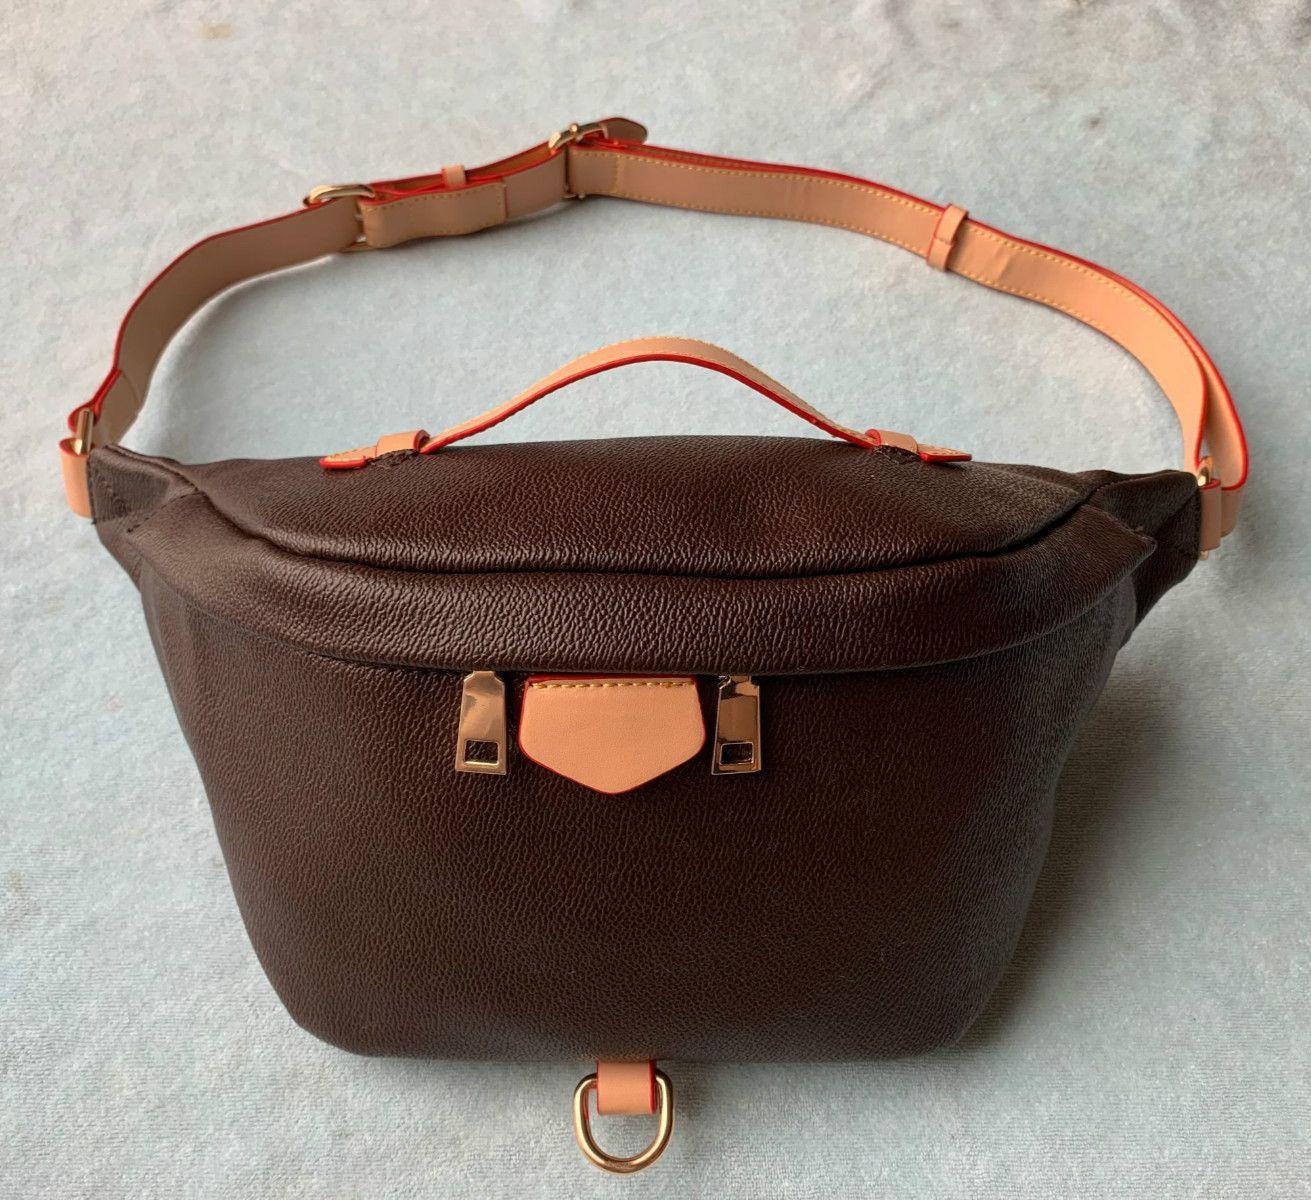 Designer nuovissimo stlye famoso marchio Bumbag Cross Body Shoulder Bag Autn Materiale Vita Borse Bumbag M43644 Cross Marsupio Marsupio Borse